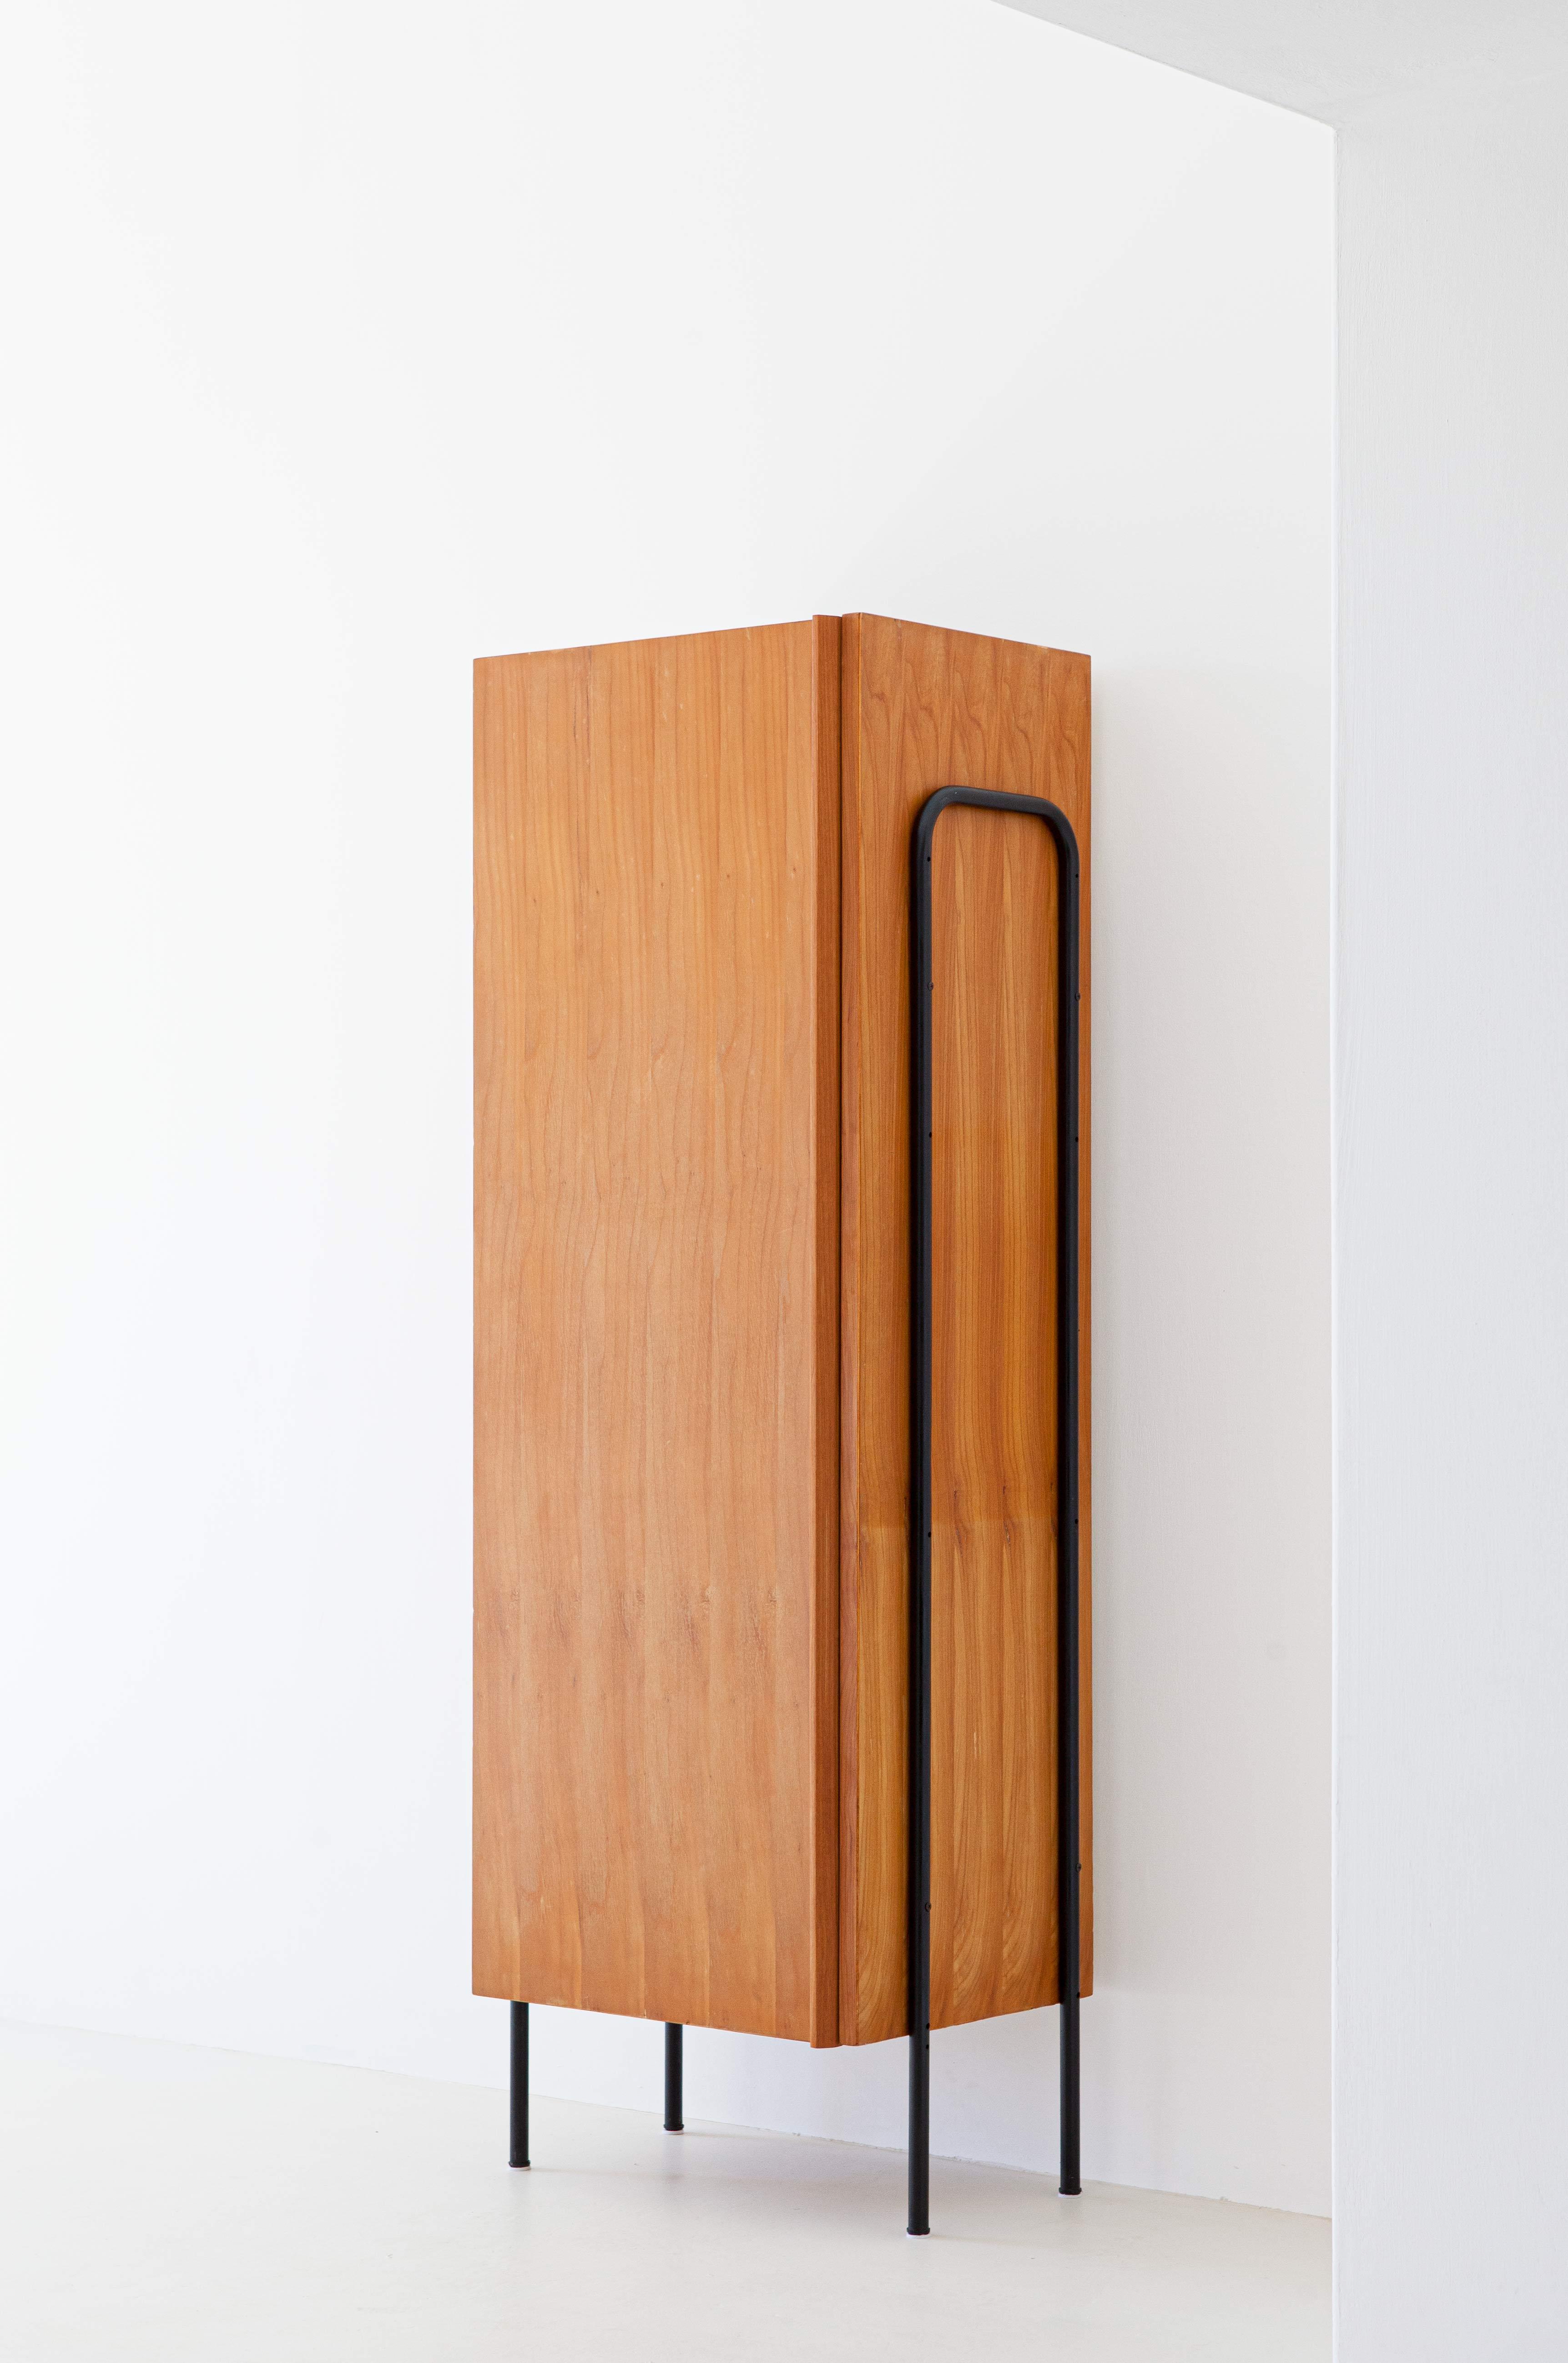 1950s-italian-light-wood-and-iron-wardrobe-cabinet-8-st114